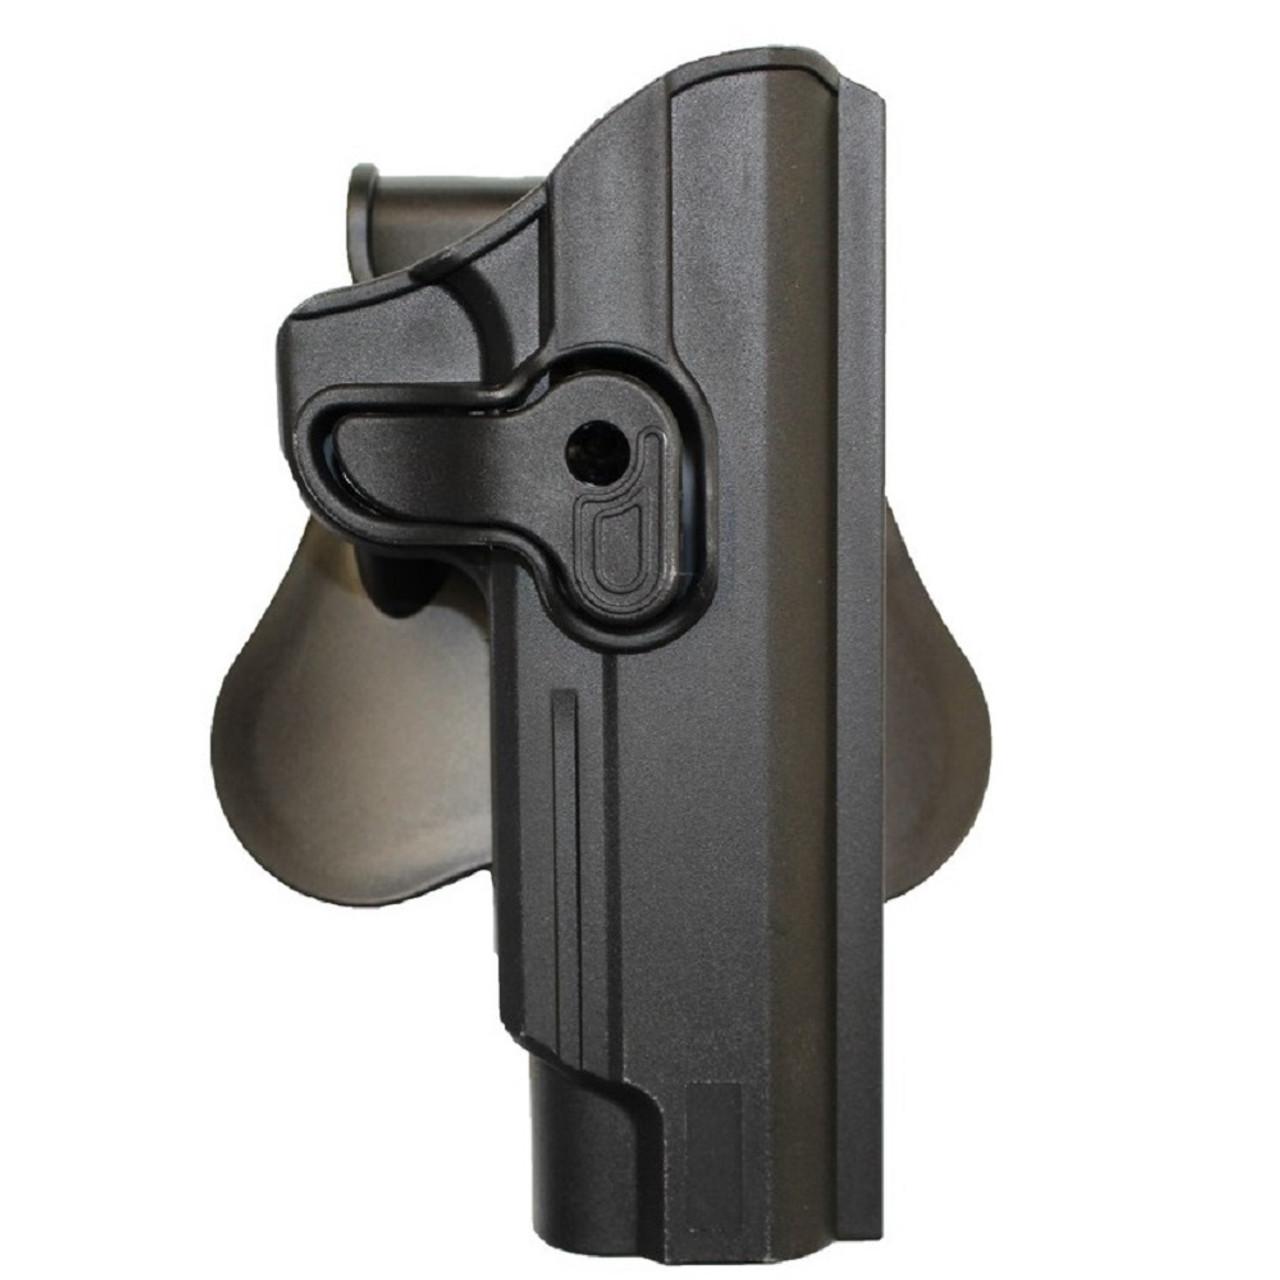 Airsoft Gun Holsters